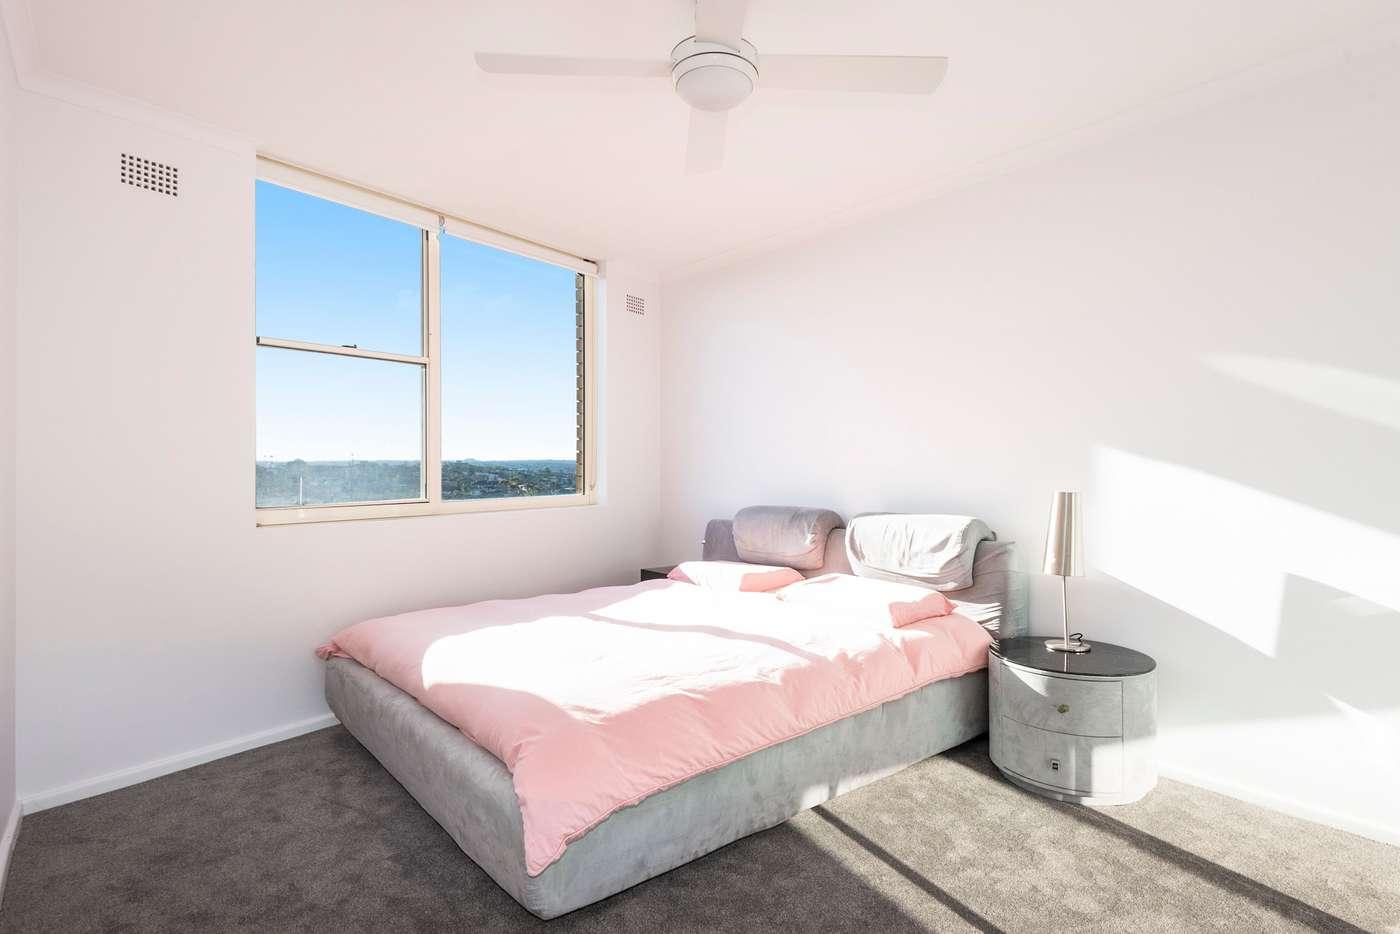 Sixth view of Homely apartment listing, 24/67 Bradleys Head Road, Mosman NSW 2088